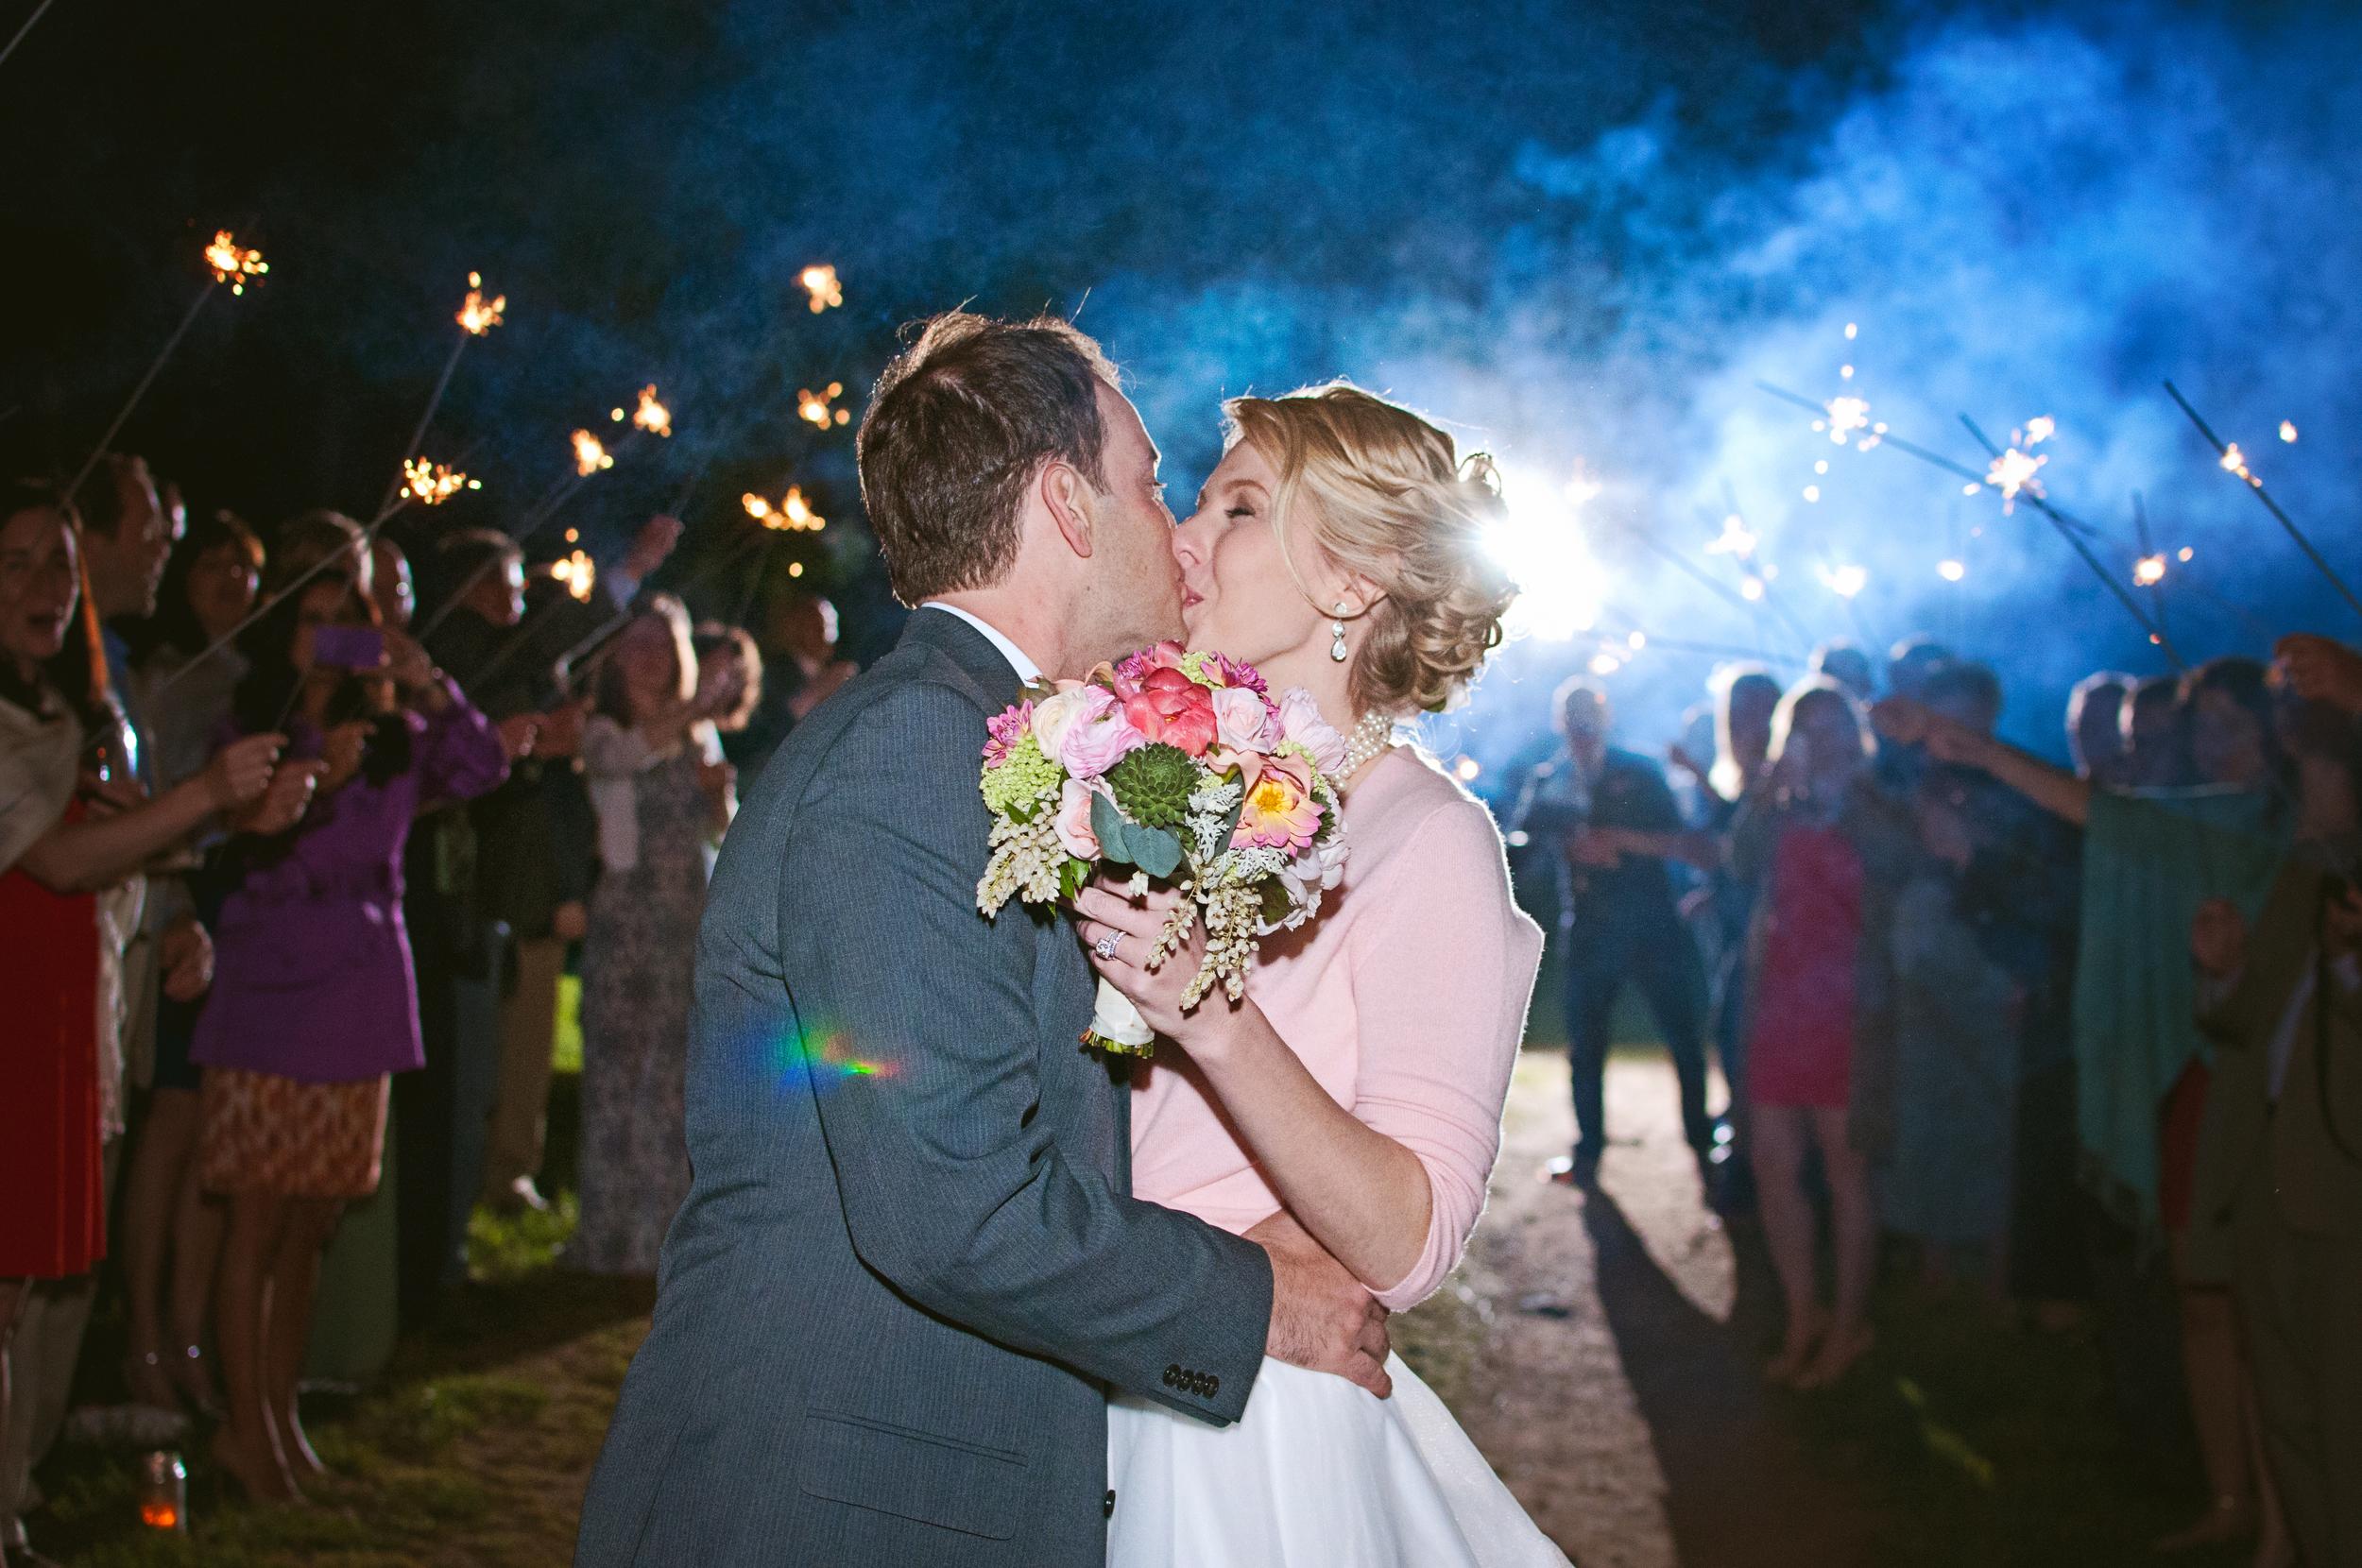 Angela_Chicoski_CT_wedding_photographer_062.jpg